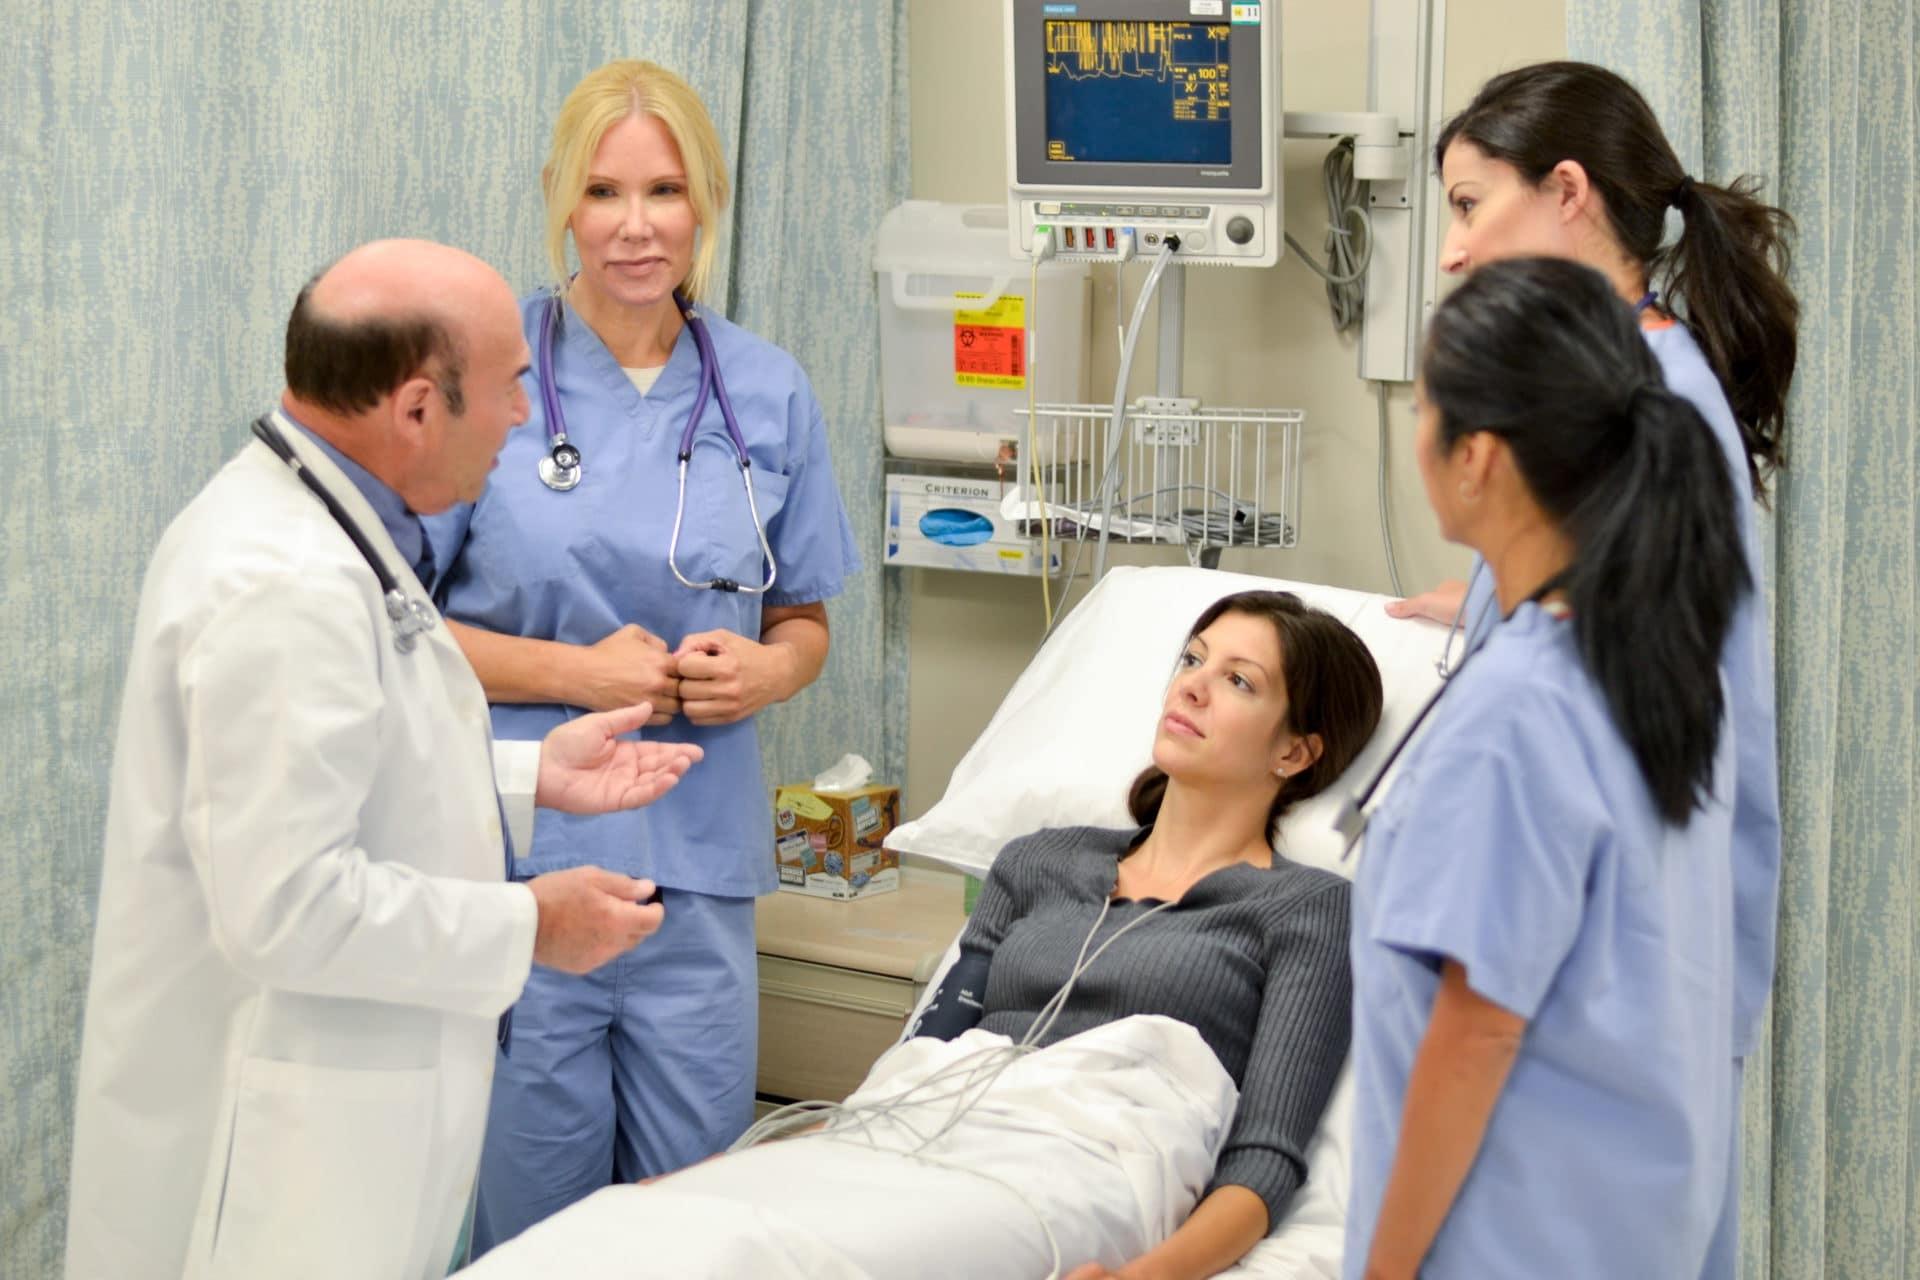 IV Ketamine Infusions Clinics Treat Depression Los Angeles ...